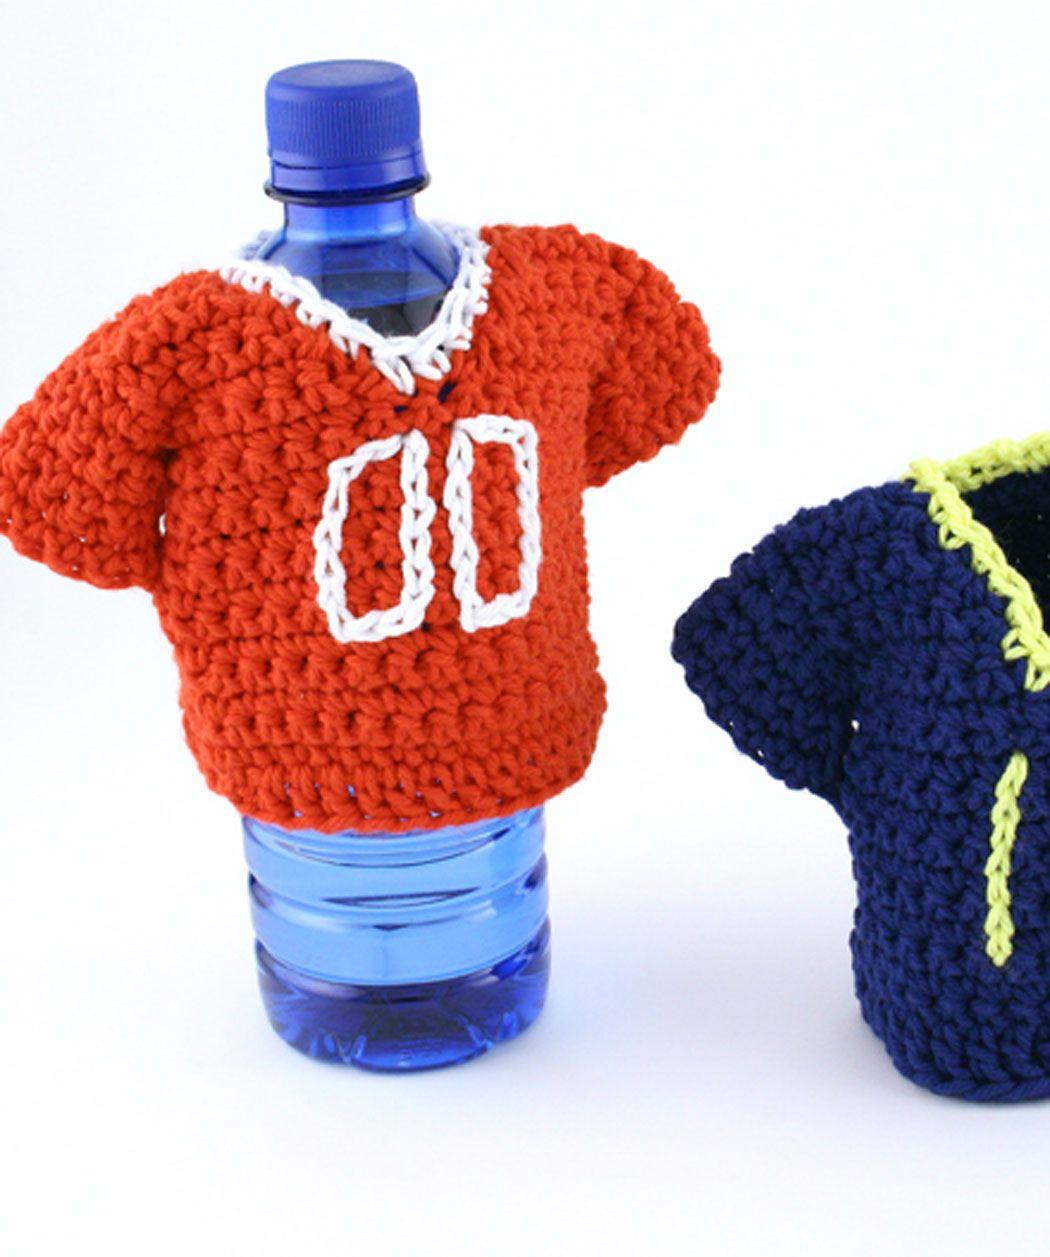 Team Jersey Bottle Coozy Free Crochet Pattern from Red Heart Yarns ...